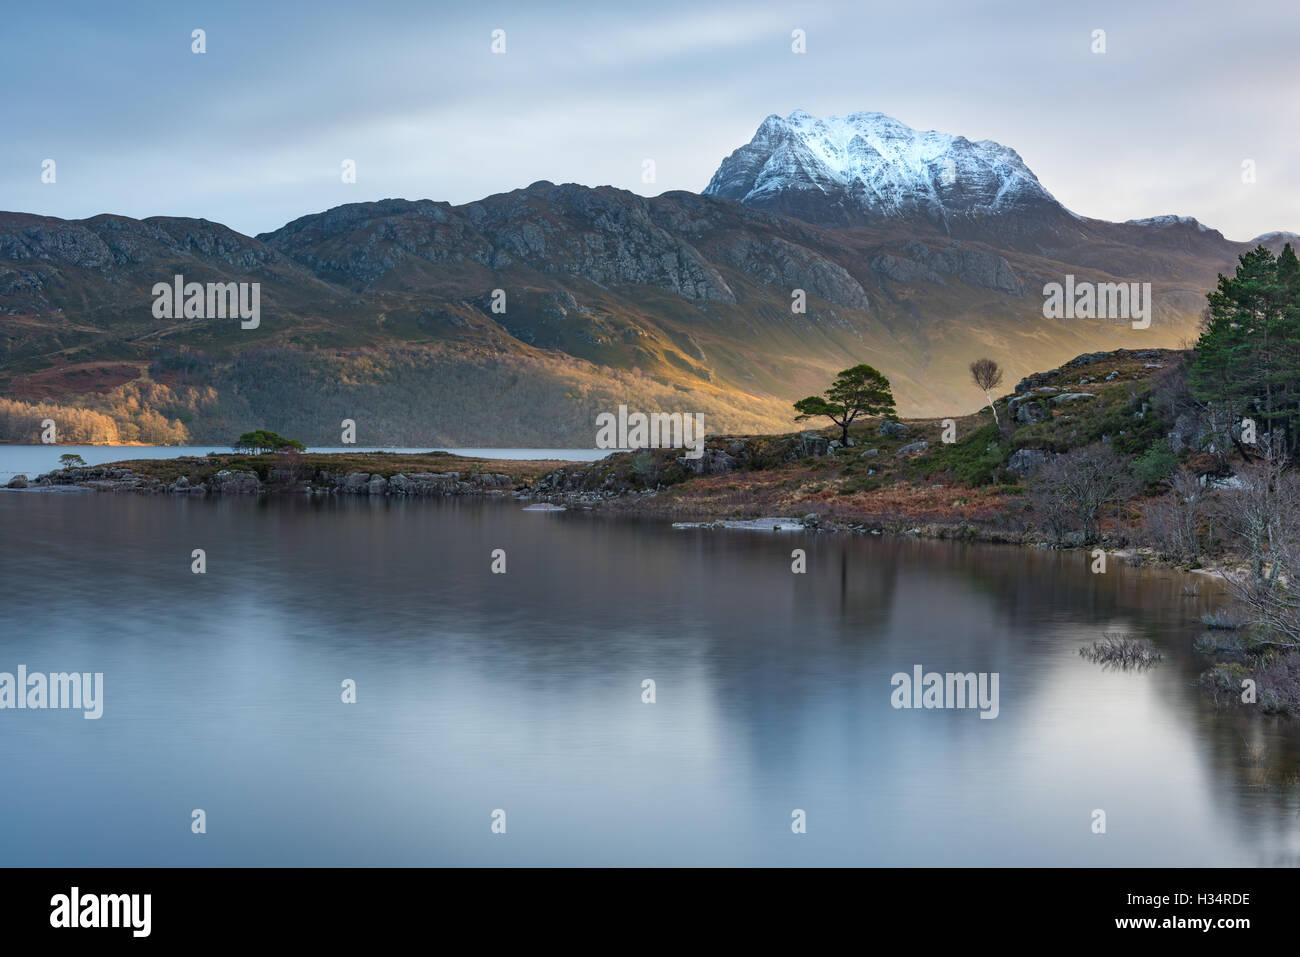 Burst of sunlight over Slioch and Loch Maree, Scottish Highlands, Scotland - Stock Image